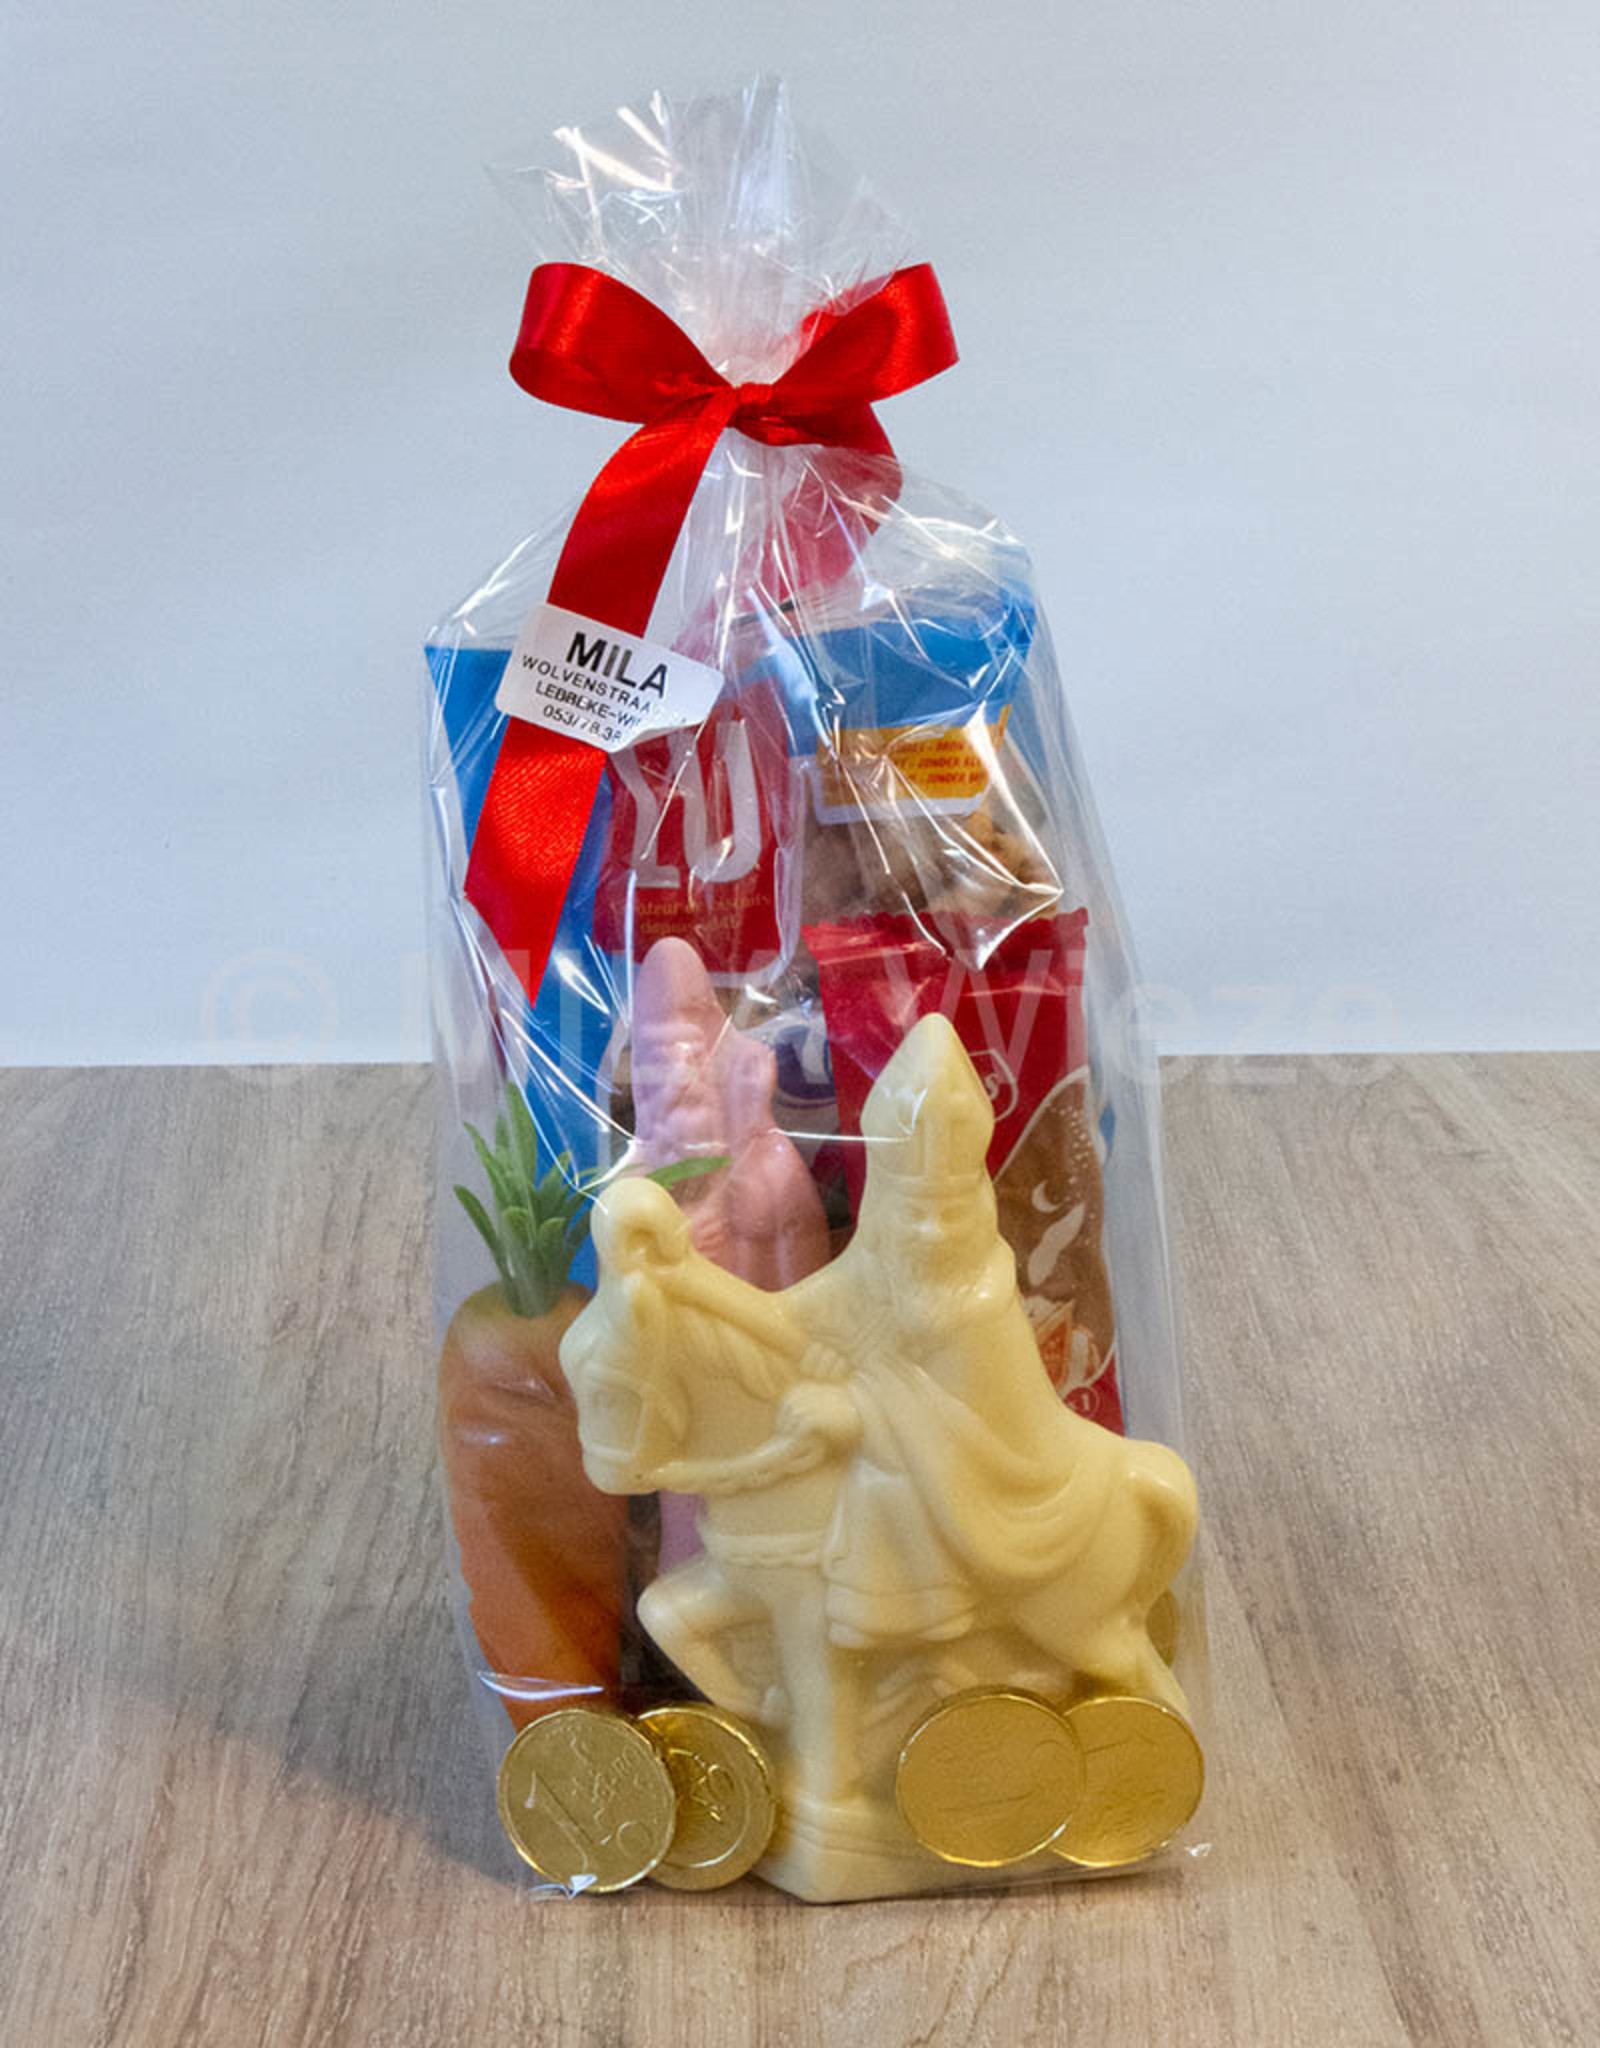 Sinterklaaspakket met  sint te paard 100 gr en snoepgoed van de Sint